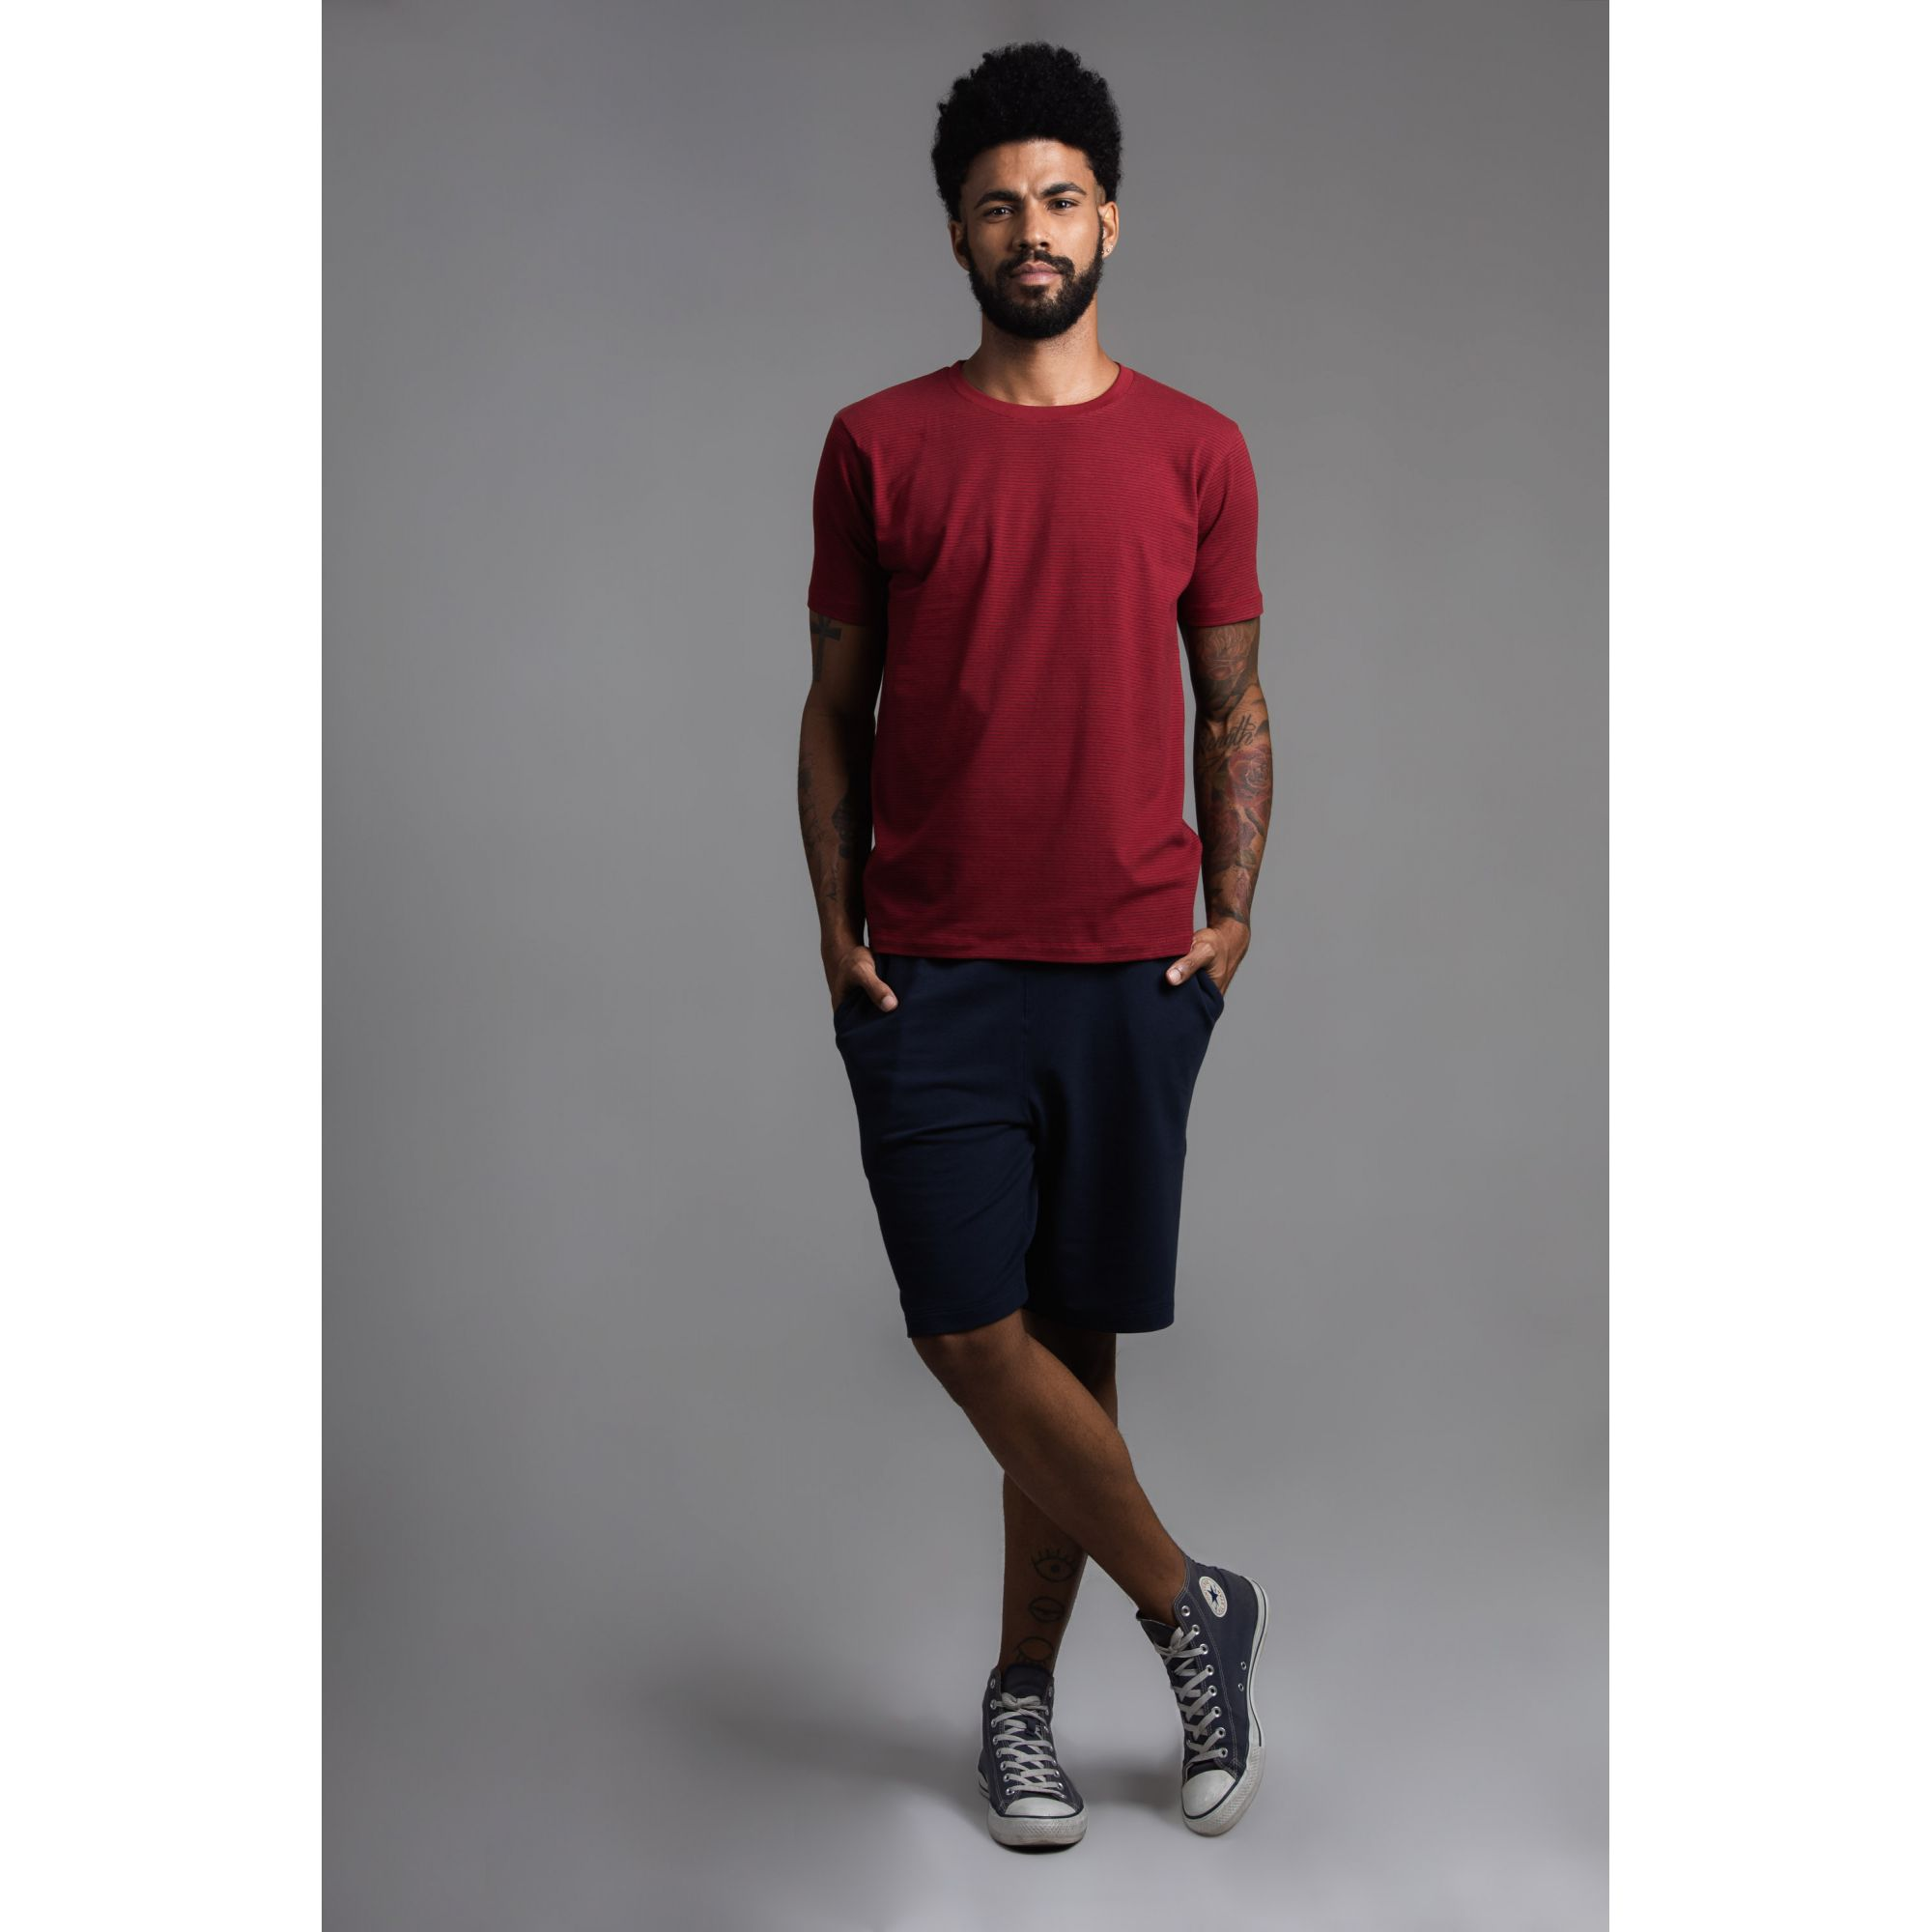 Camisa Masculina Básica Manga Curta